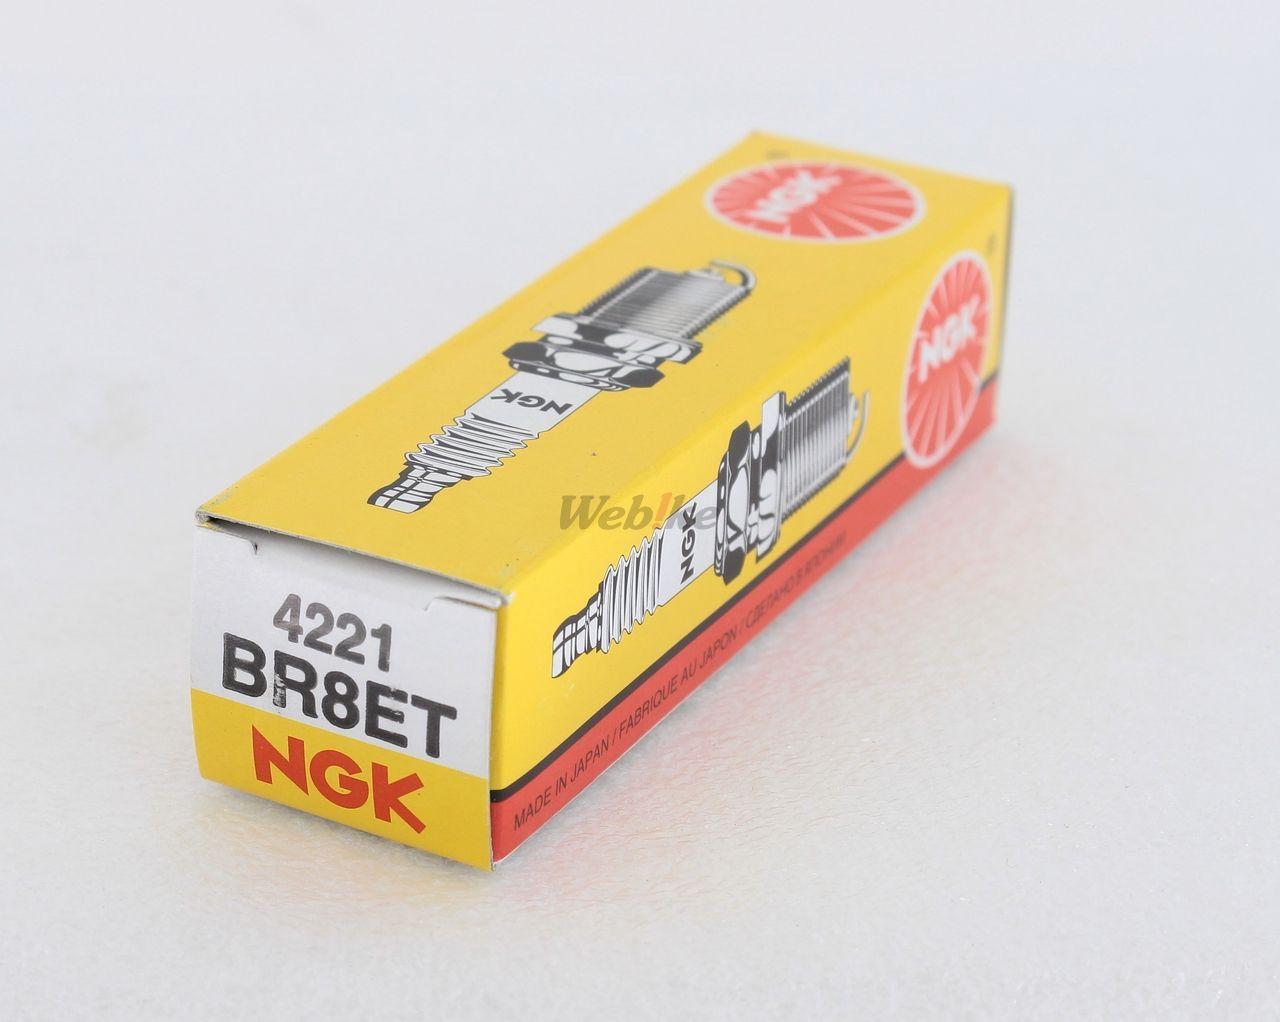 【NGK】標準型 火星塞 BR8ET 4221 - 「Webike-摩托百貨」